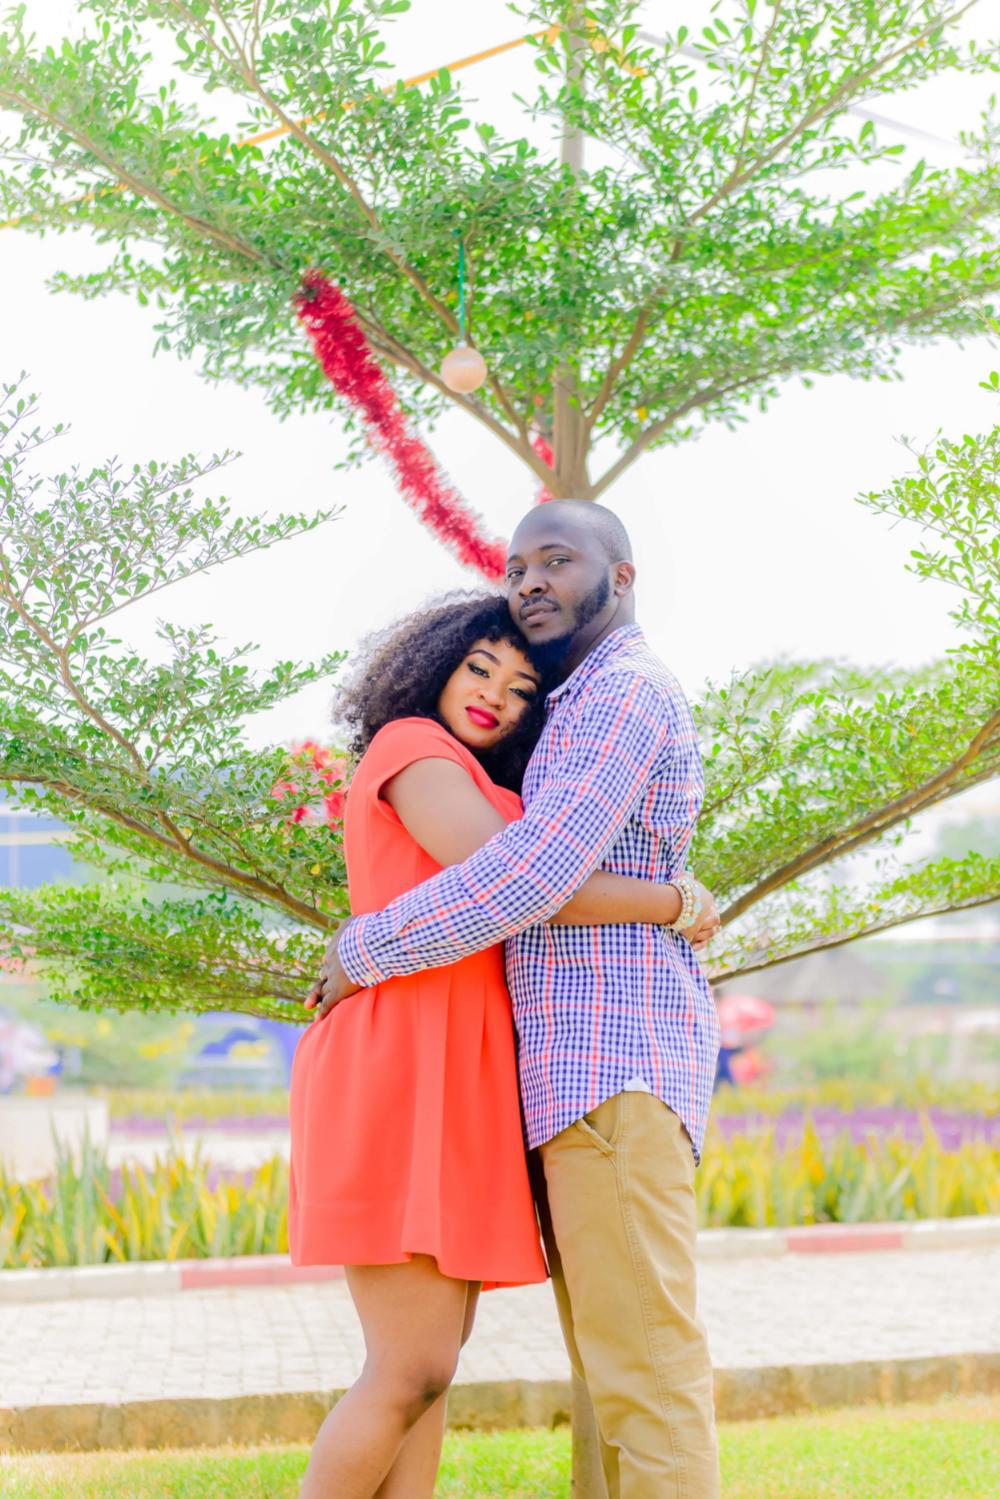 Pre-Wedding Pictures By SpicyInc Studio - Nigerian Wedding Photographers